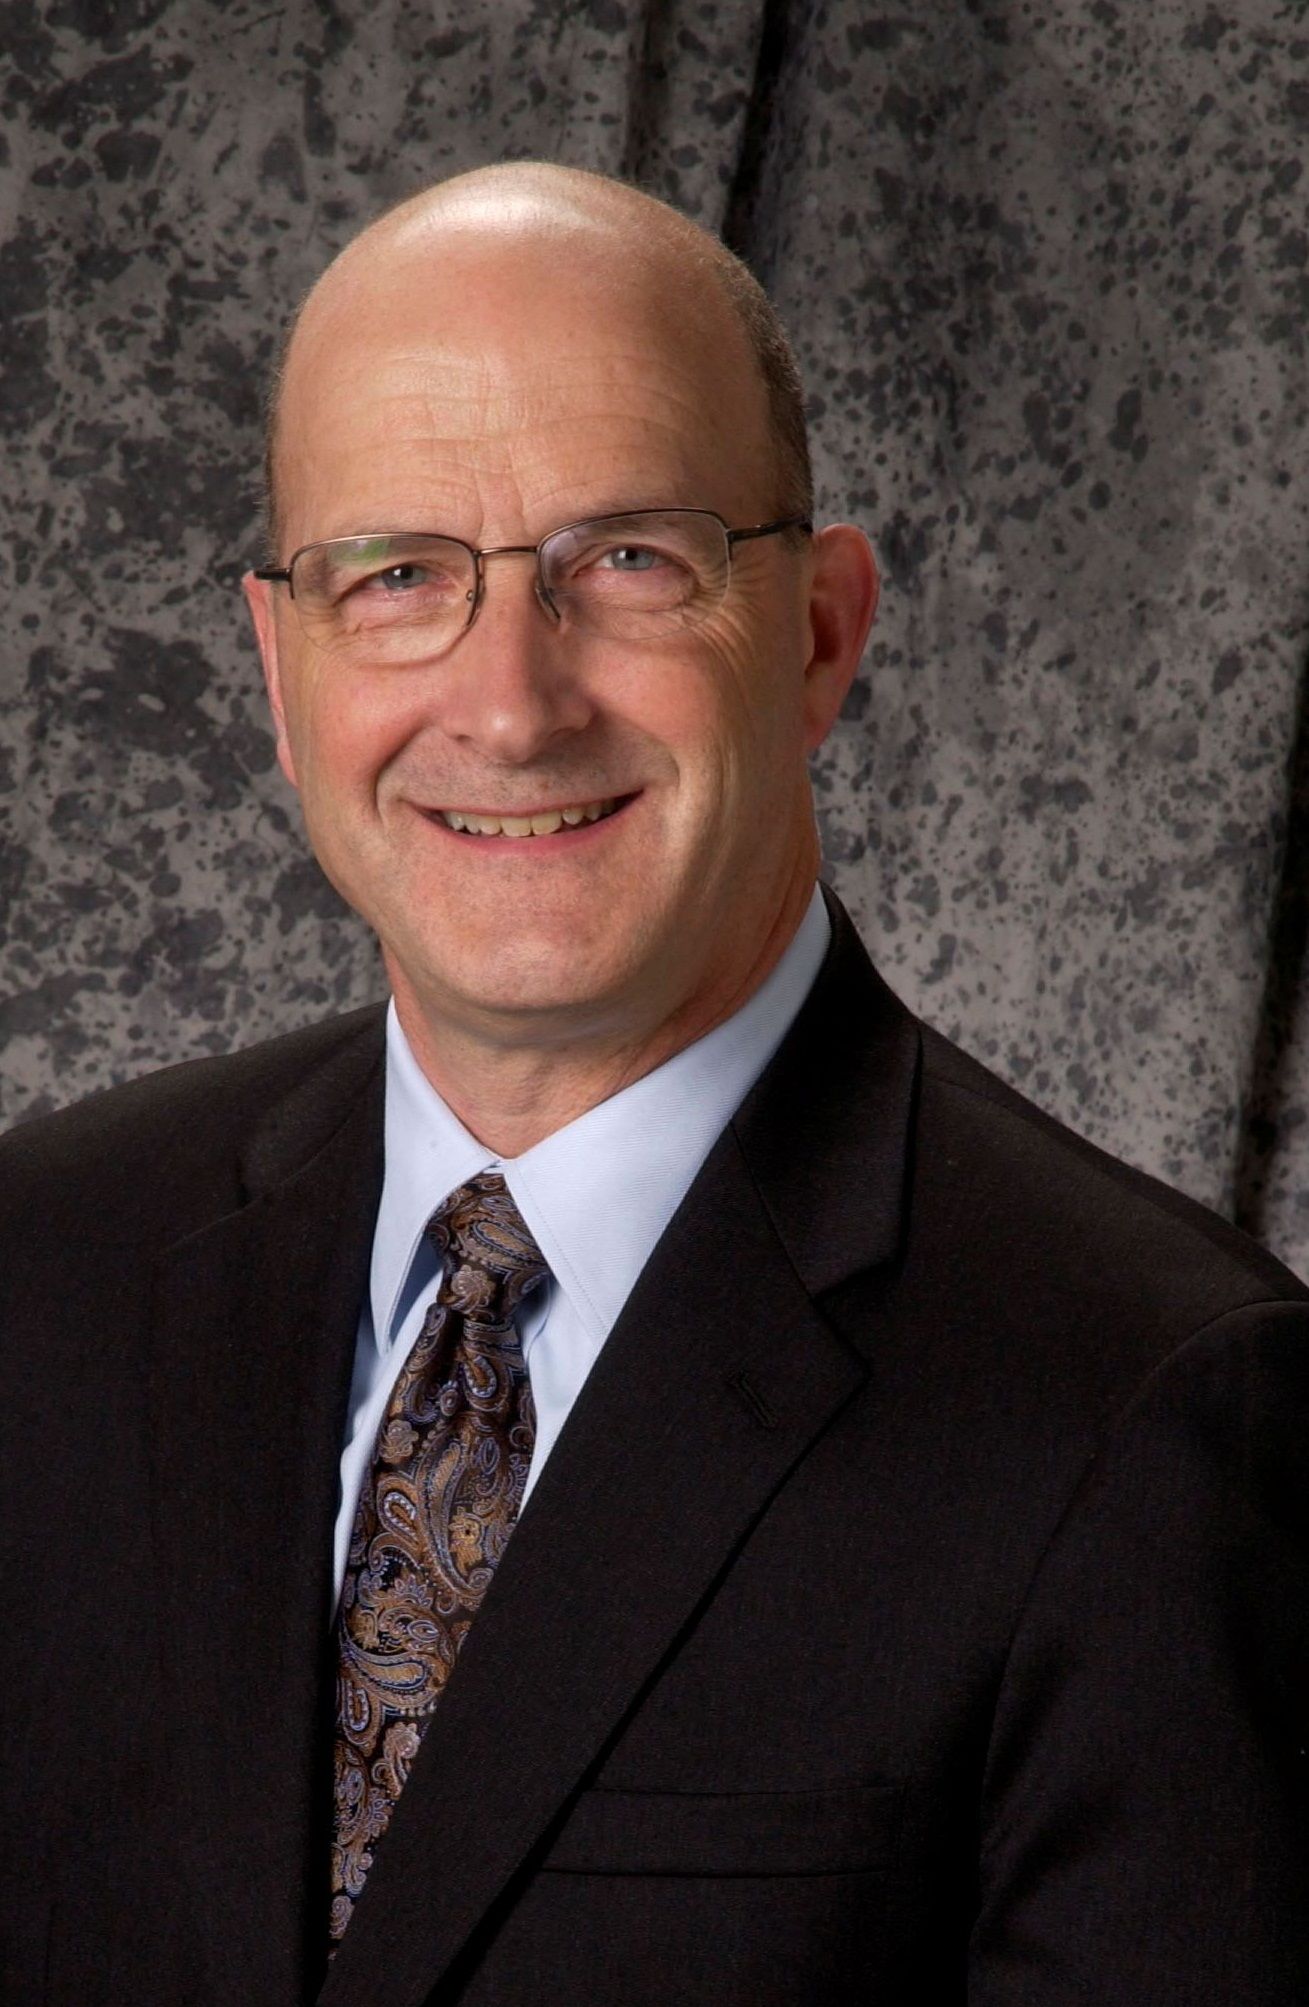 Dr. J. Michael Stebbins